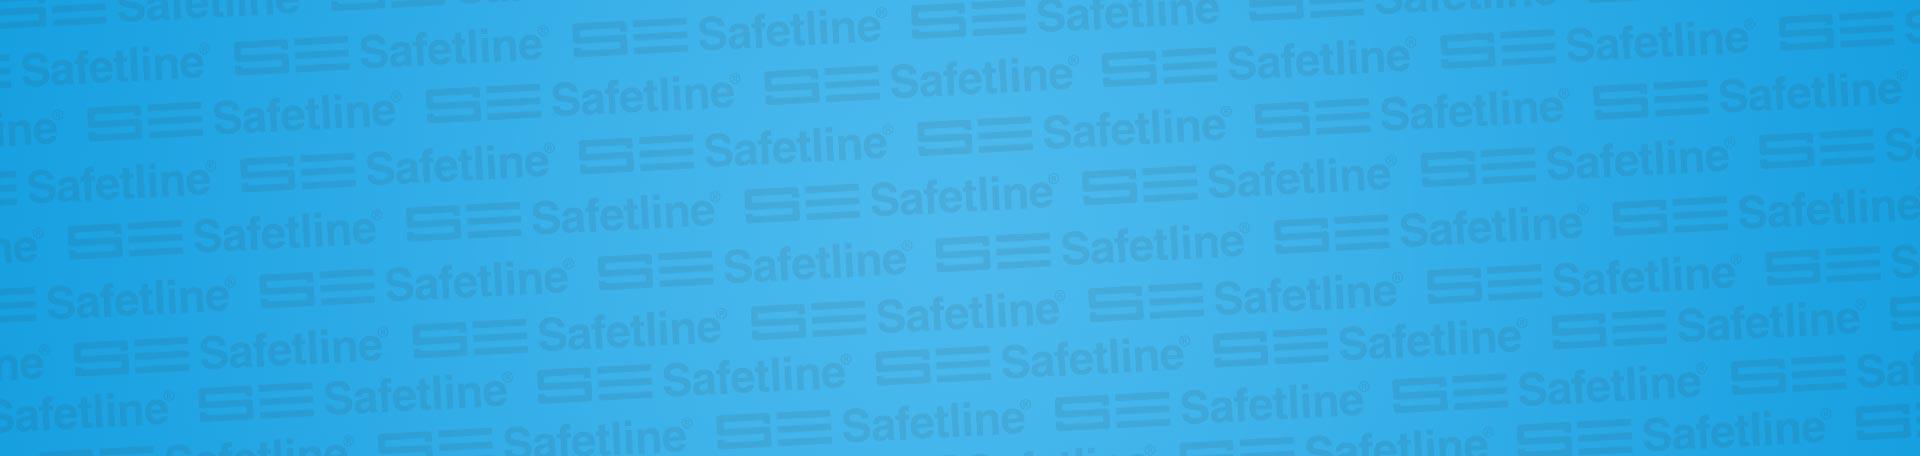 Banner_tecnologias-site-bg